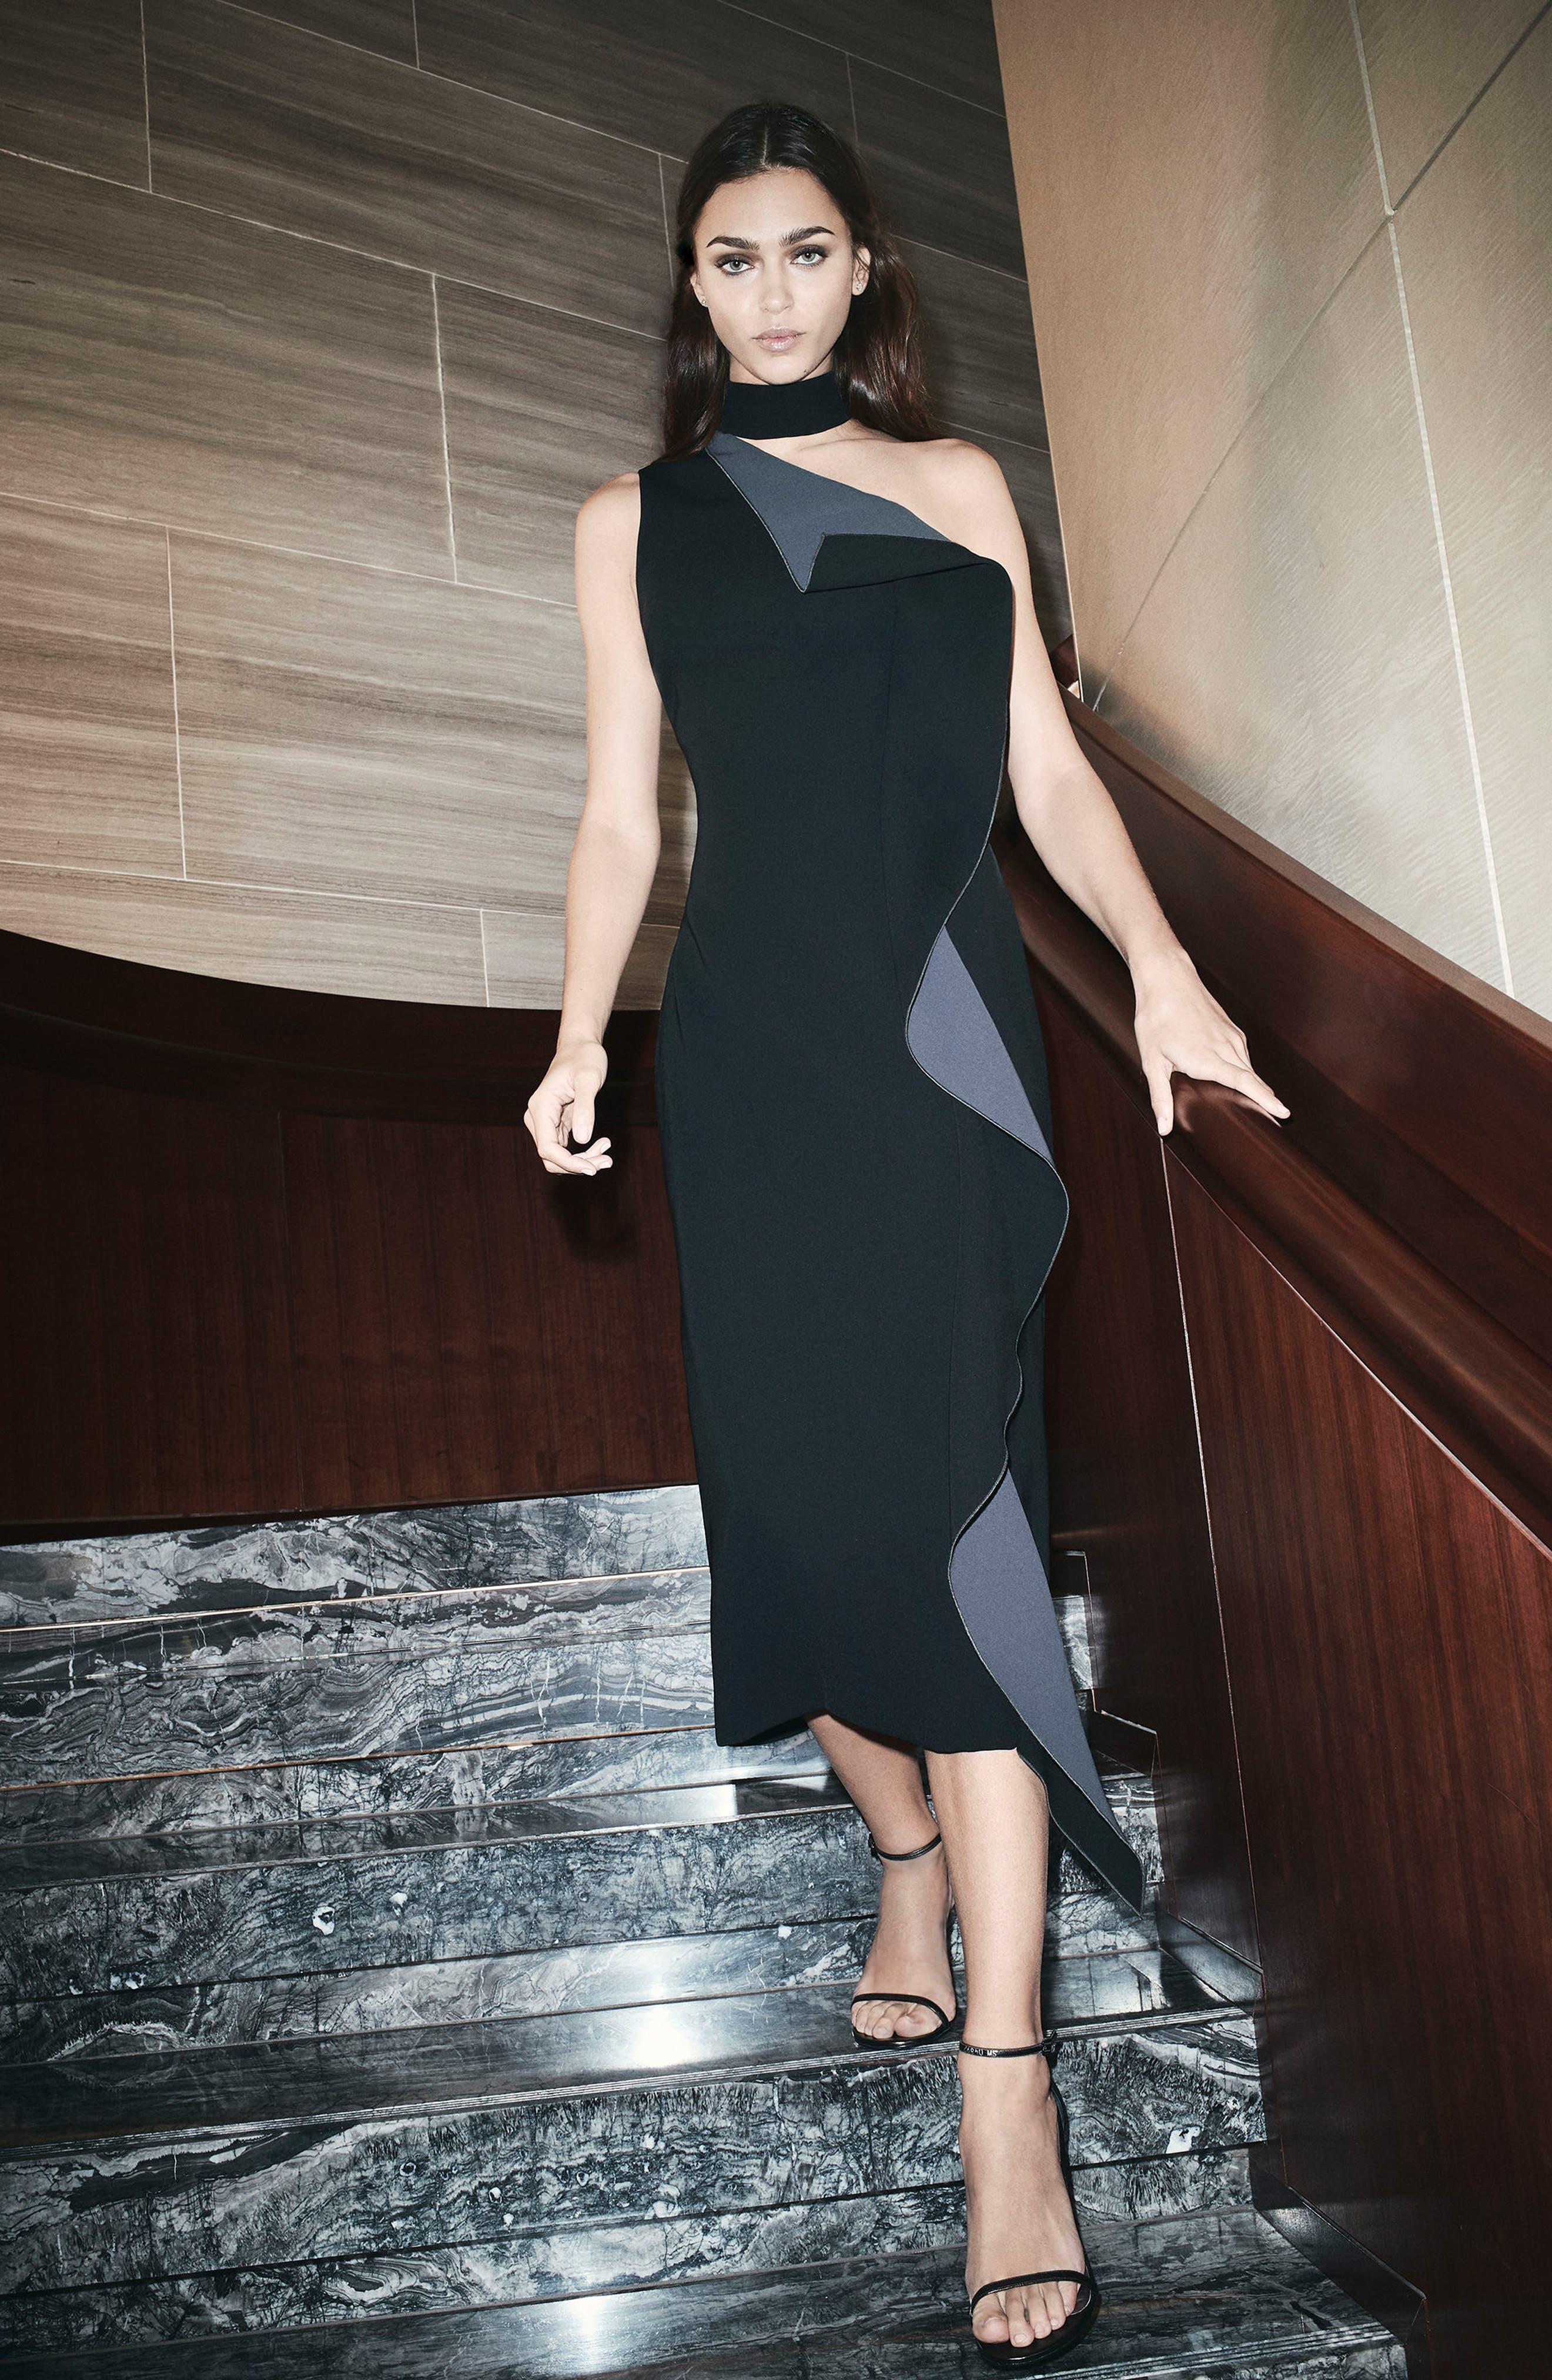 Elettra Ruffle Front Bonded Crepe Halter Dress,                             Alternate thumbnail 2, color,                             Black/ Graphite